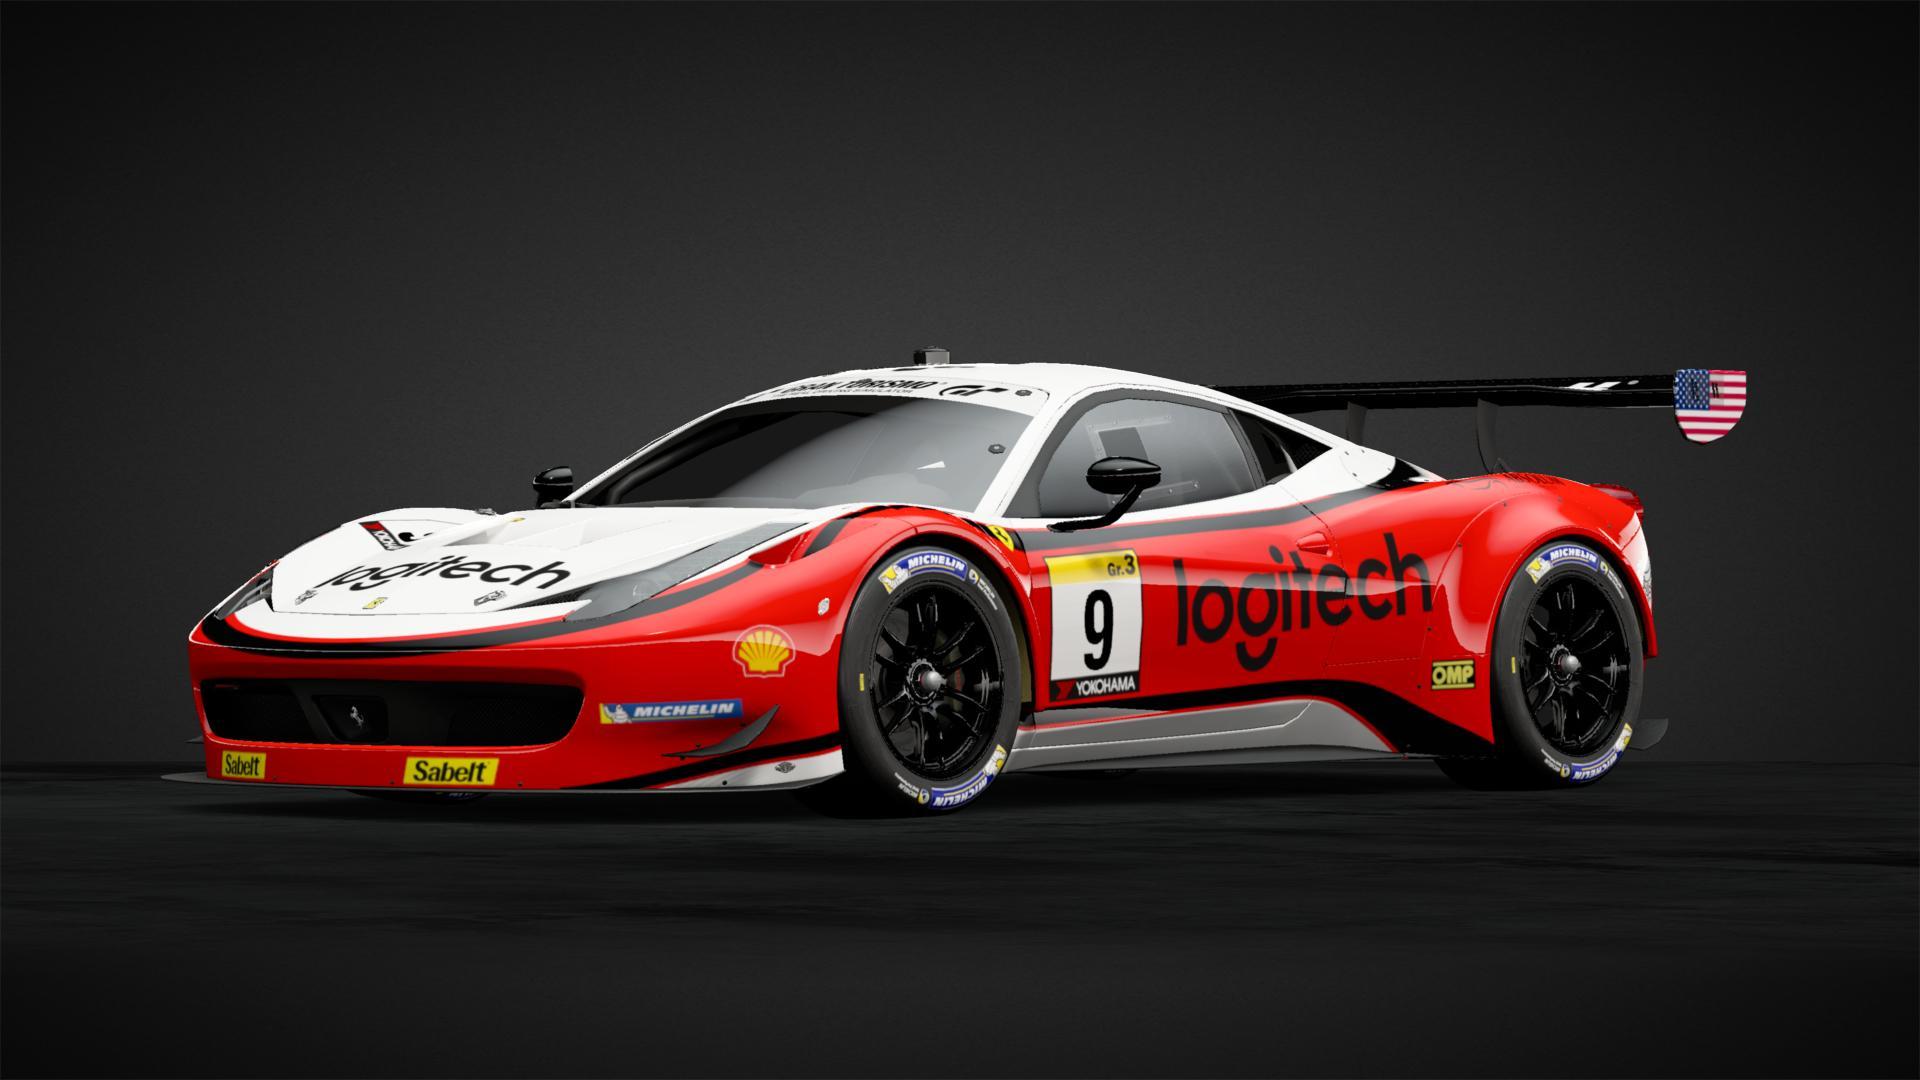 9 Ferrari 458 Gt3 Team Afcorse Car Livery By Demineur Bv Community Gran Turismo Sport